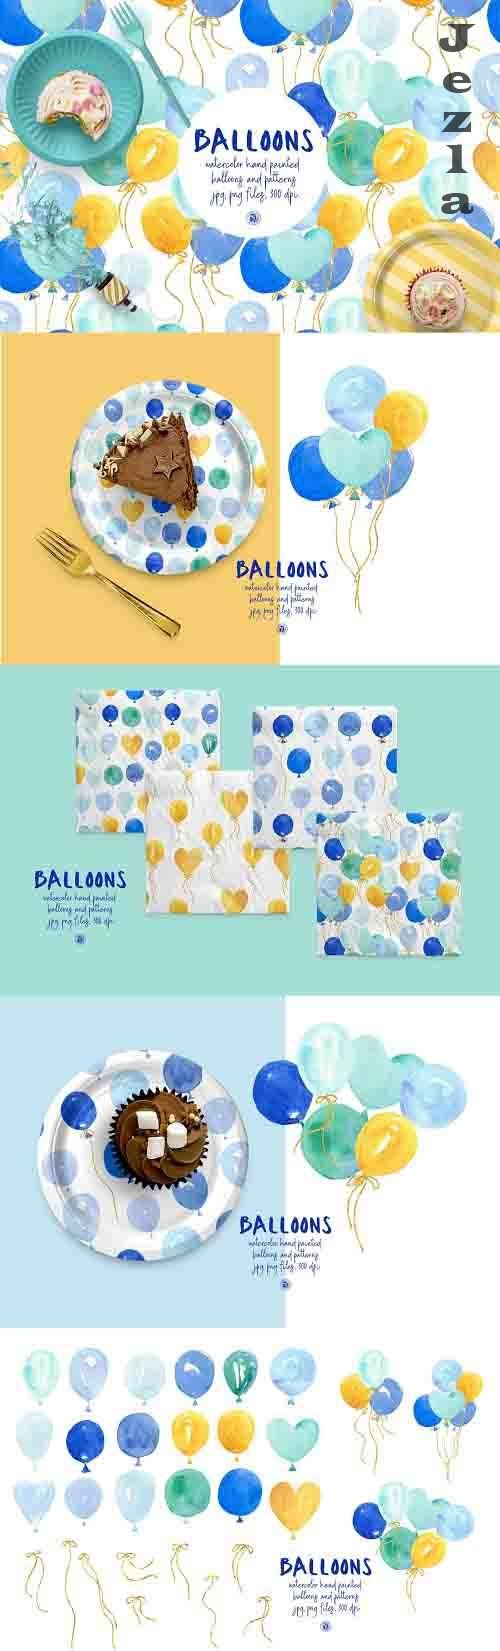 Watercolor Balloons vol 3 - 6228579